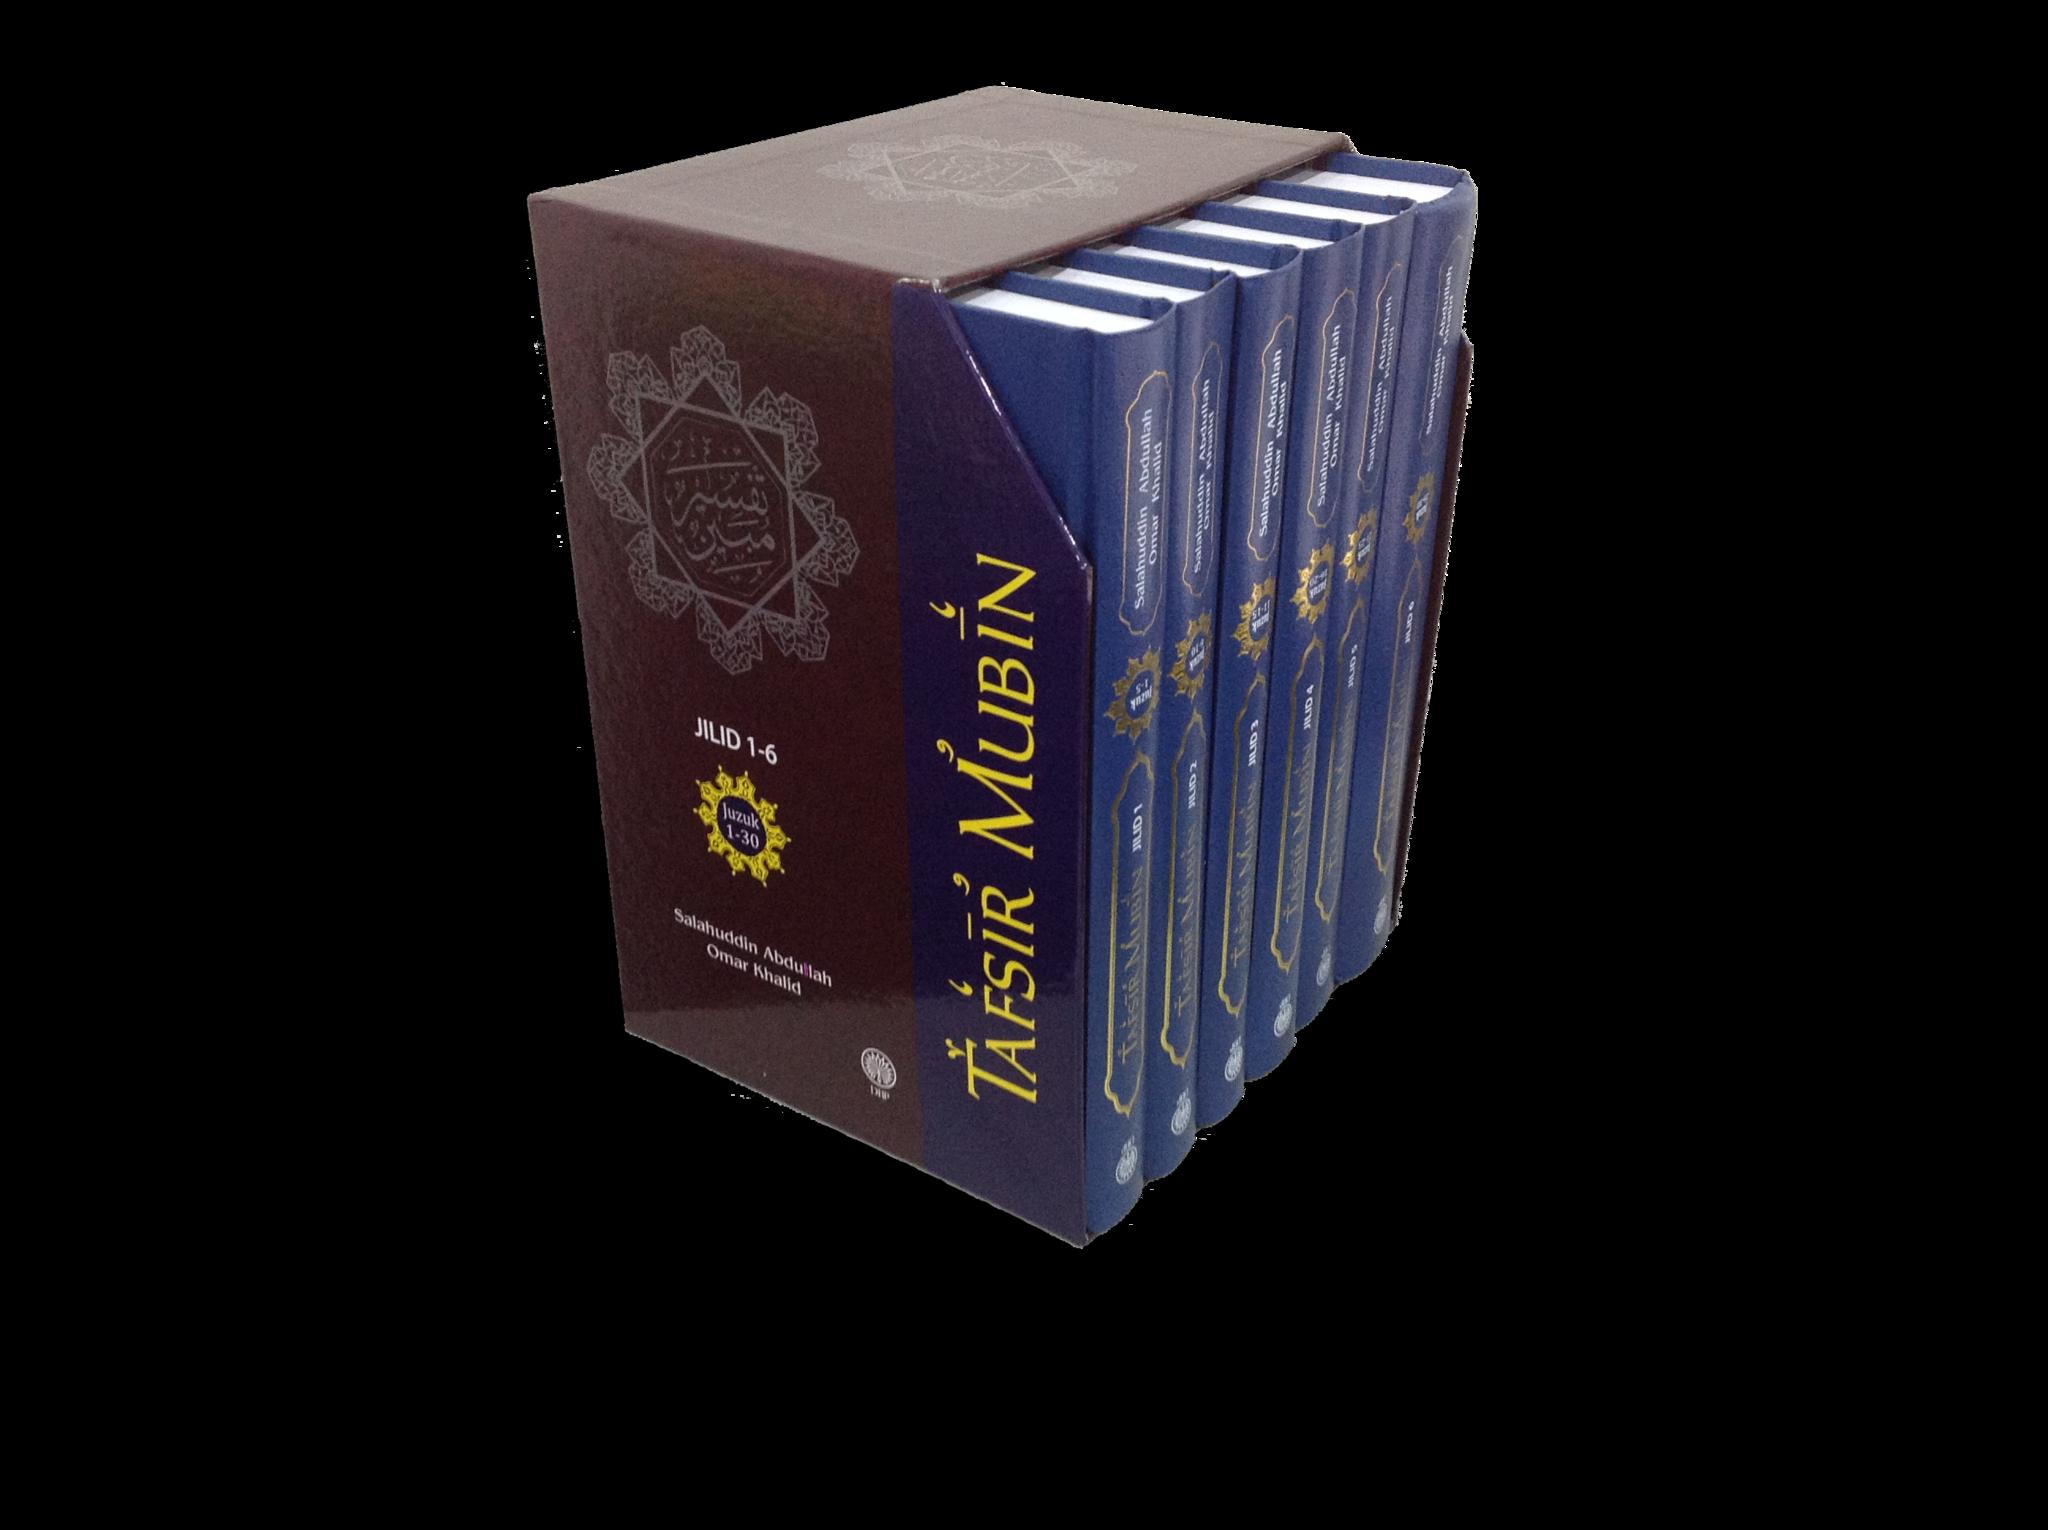 dewan-bahasa-dan-pustaka-tafsir-mubin-jilid-1-6-juzuk-1-30-9789834604417_2048x.png